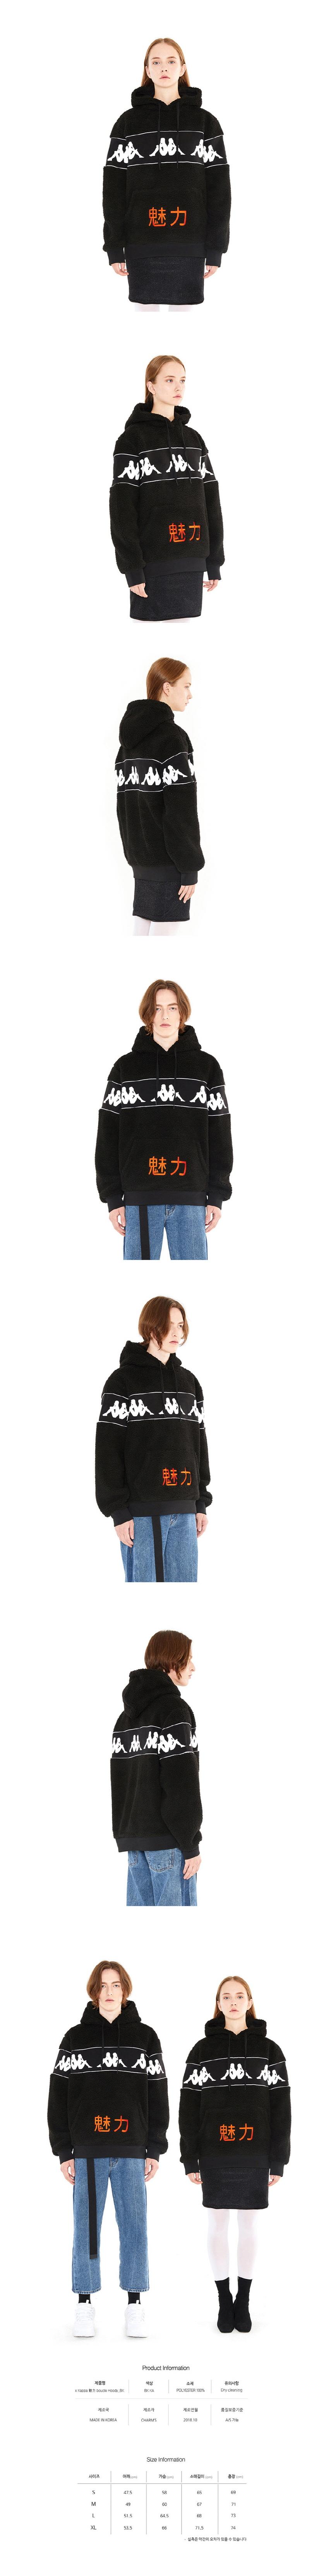 x Kappa 魅力 boucle Hoody_BK.jpg